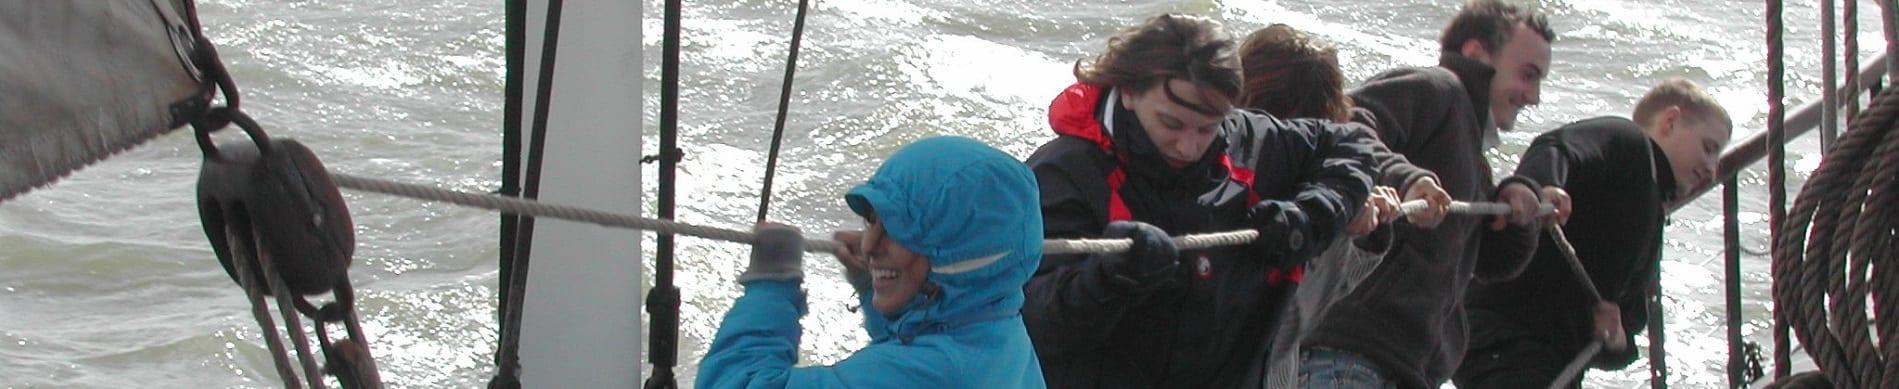 Klassenfahrt IJsselmeer